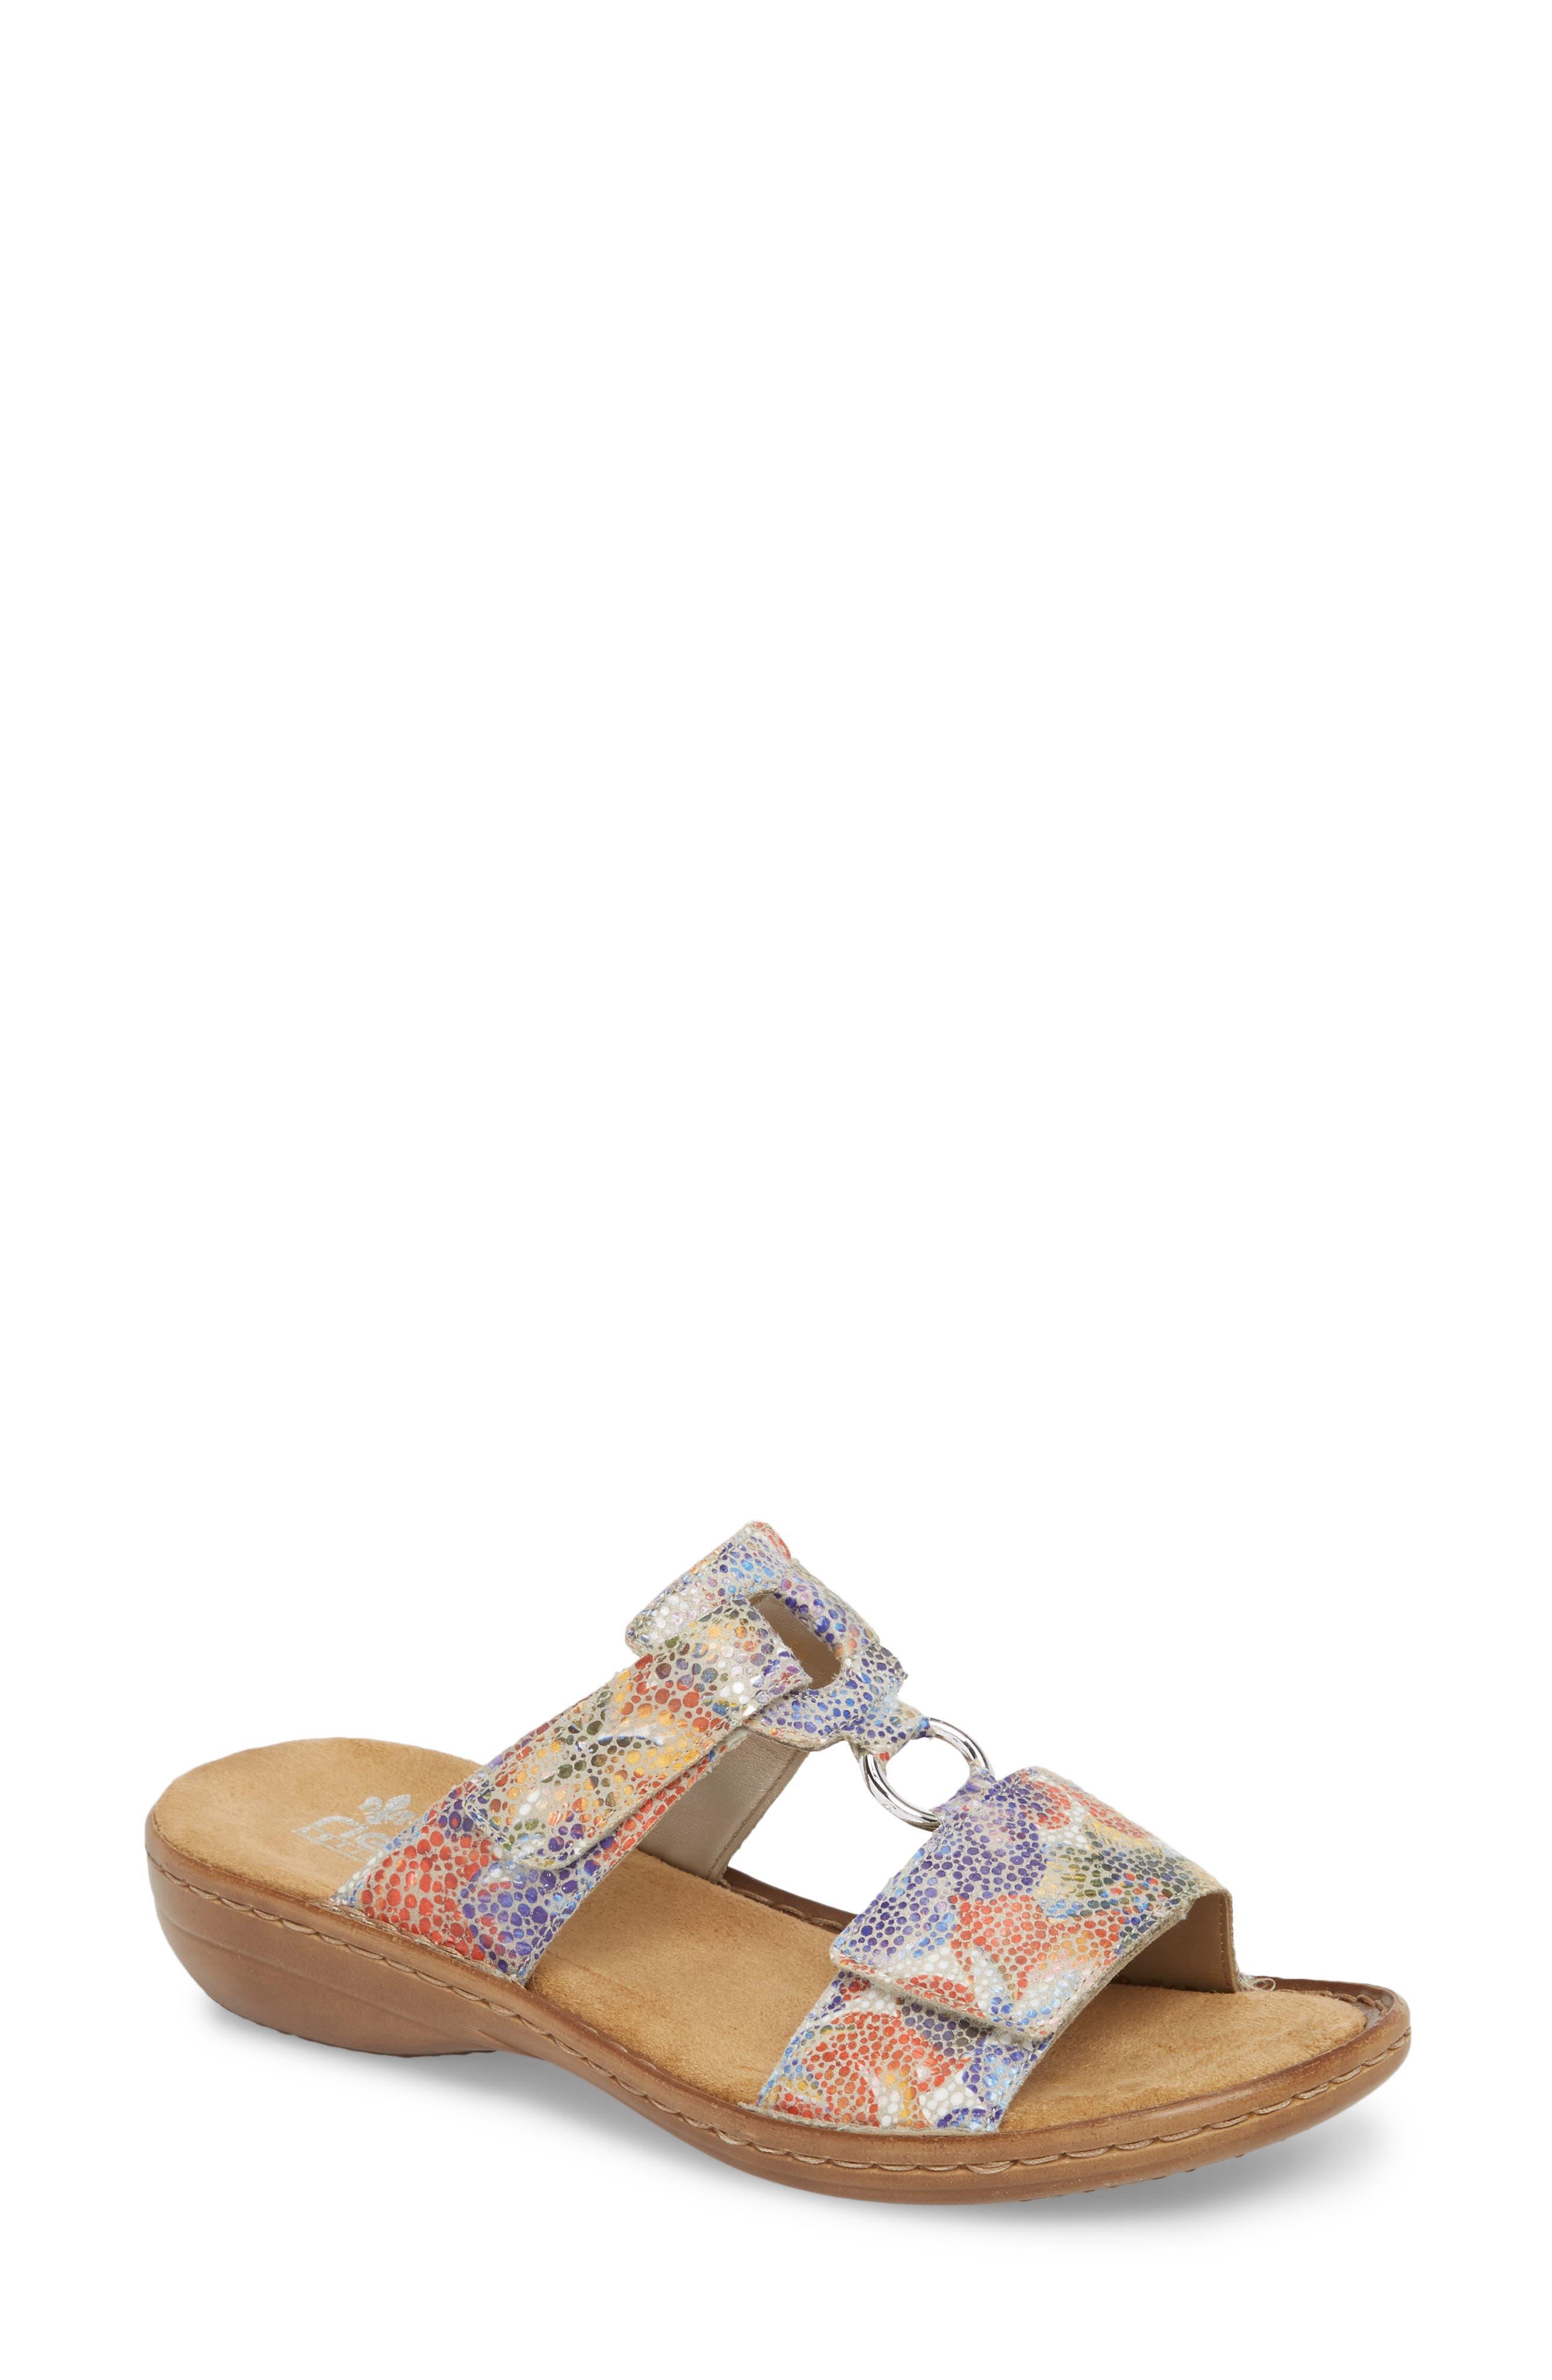 Regina P9 Slide Sandal,                         Main,                         color, WHITE MULTI FABRIC